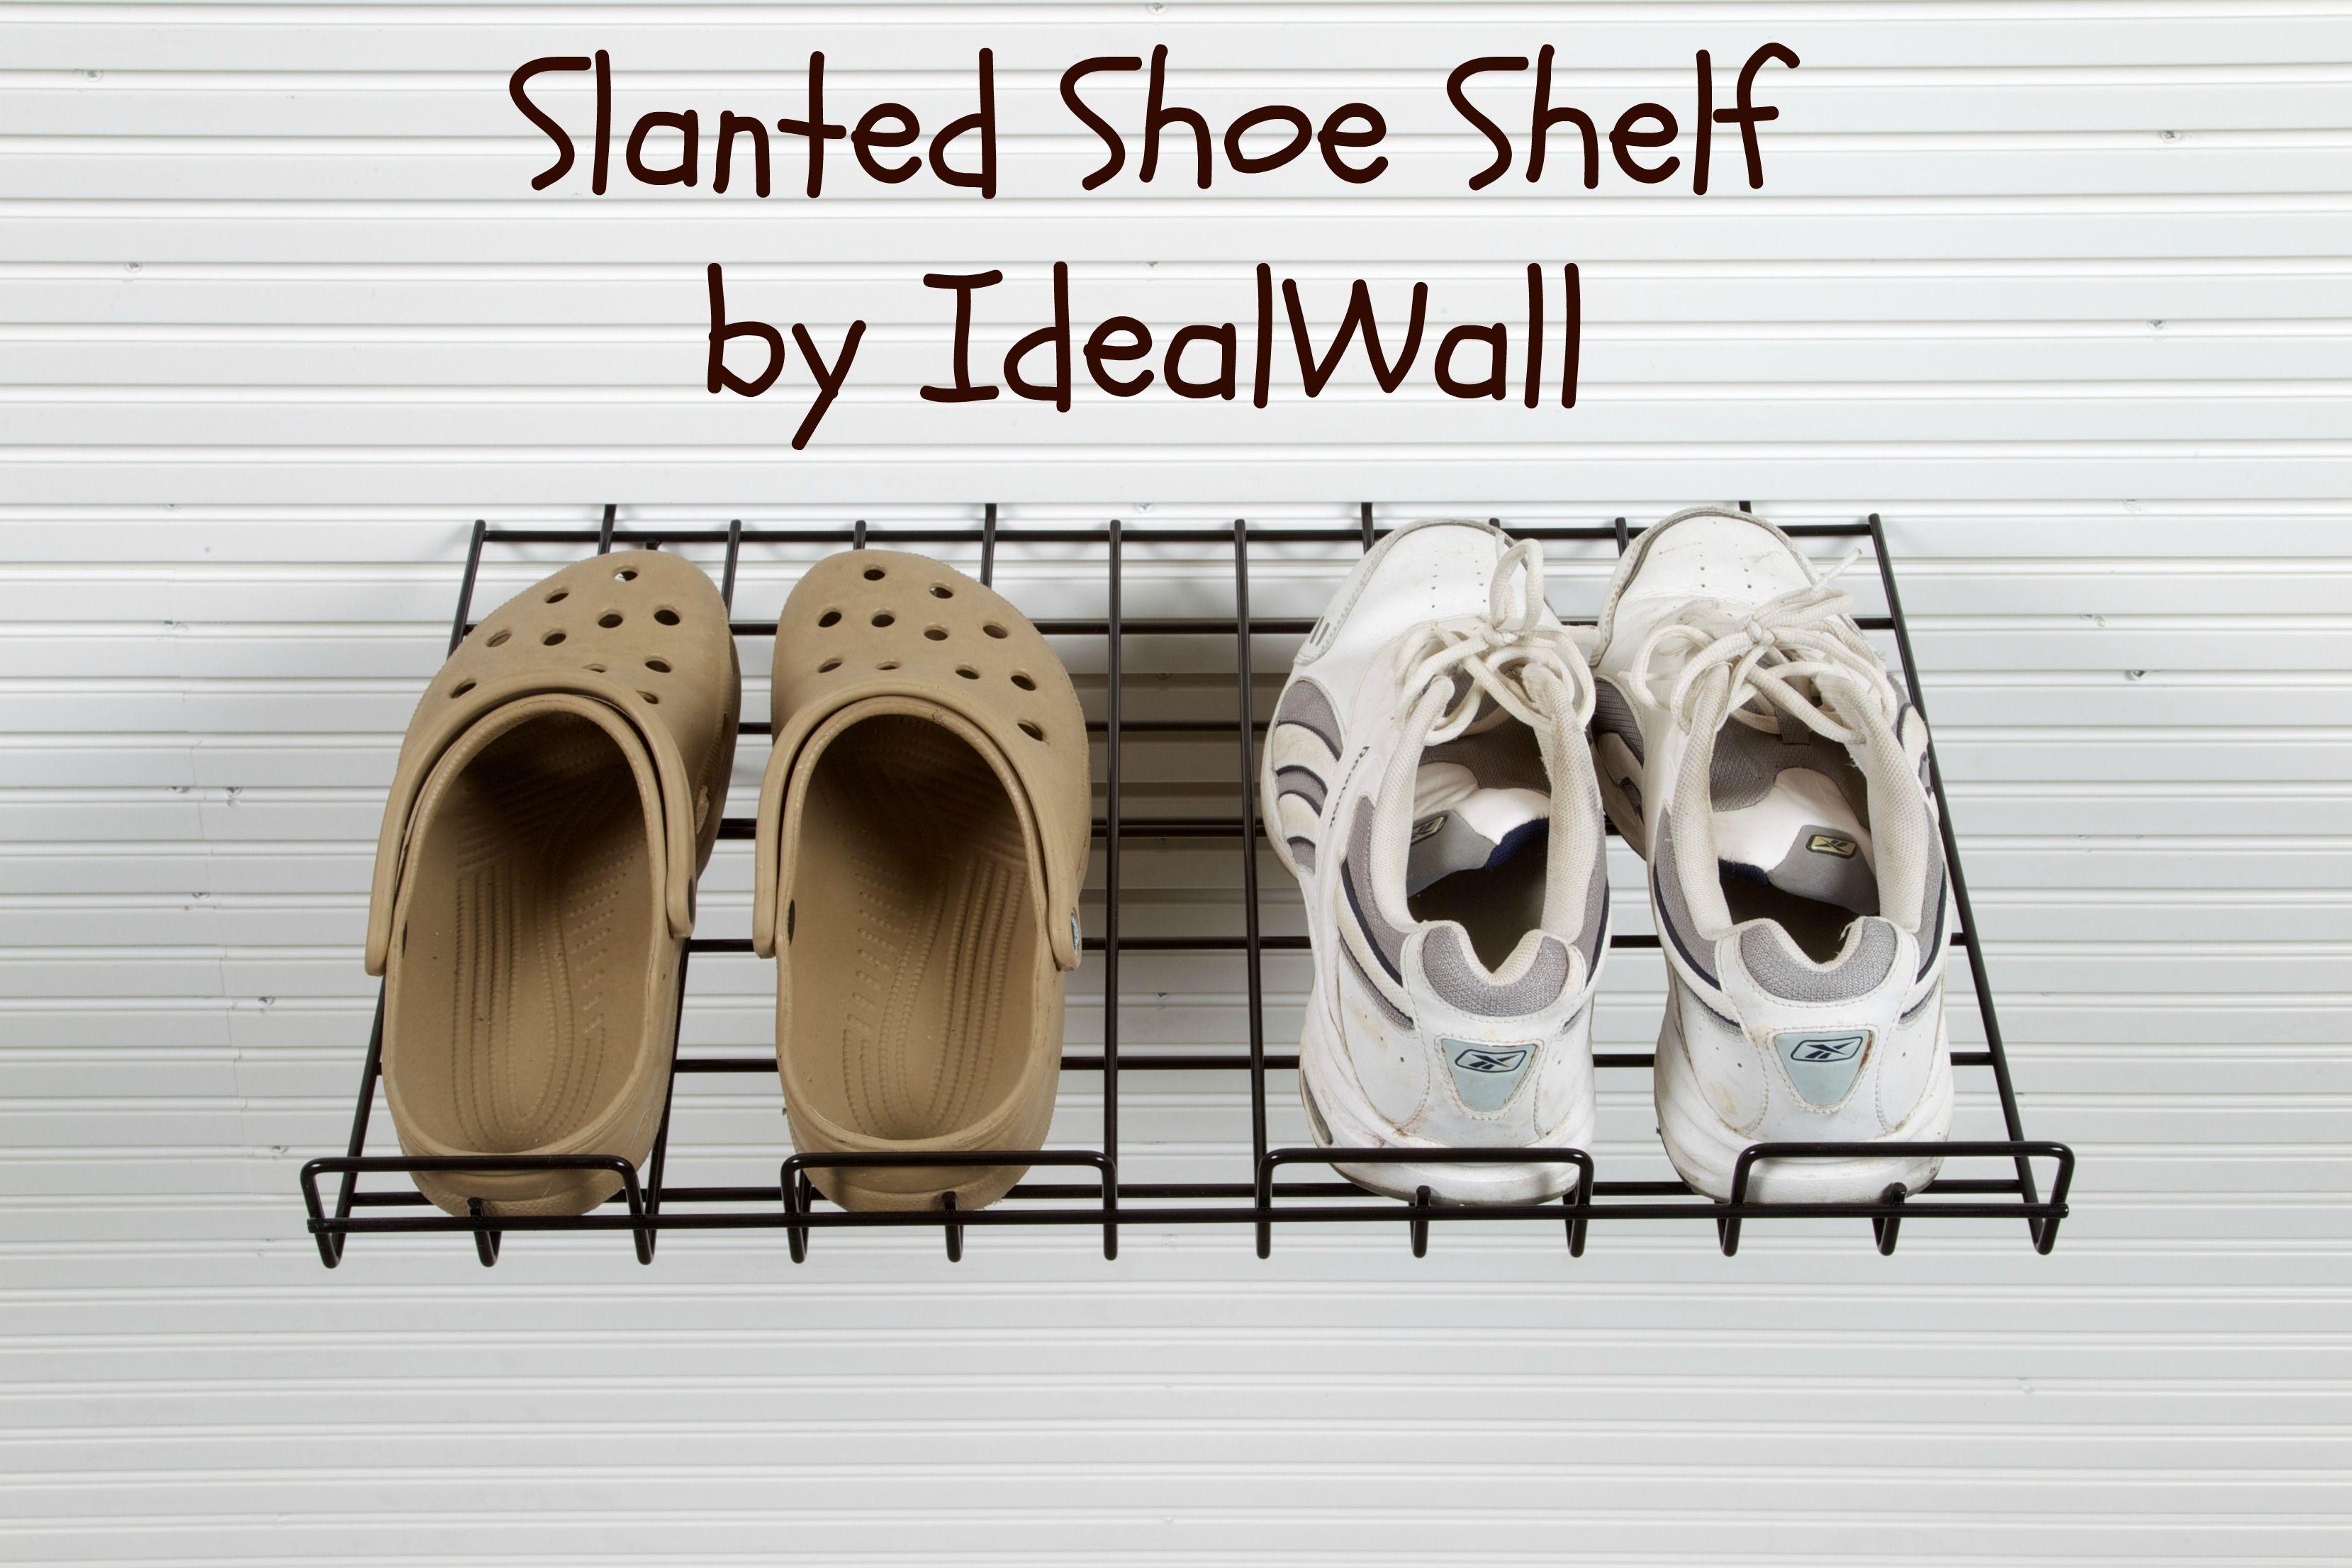 SlatWall Accessories - Slanted Shoe Shelf • Only $12.99 but heels may not feel so well